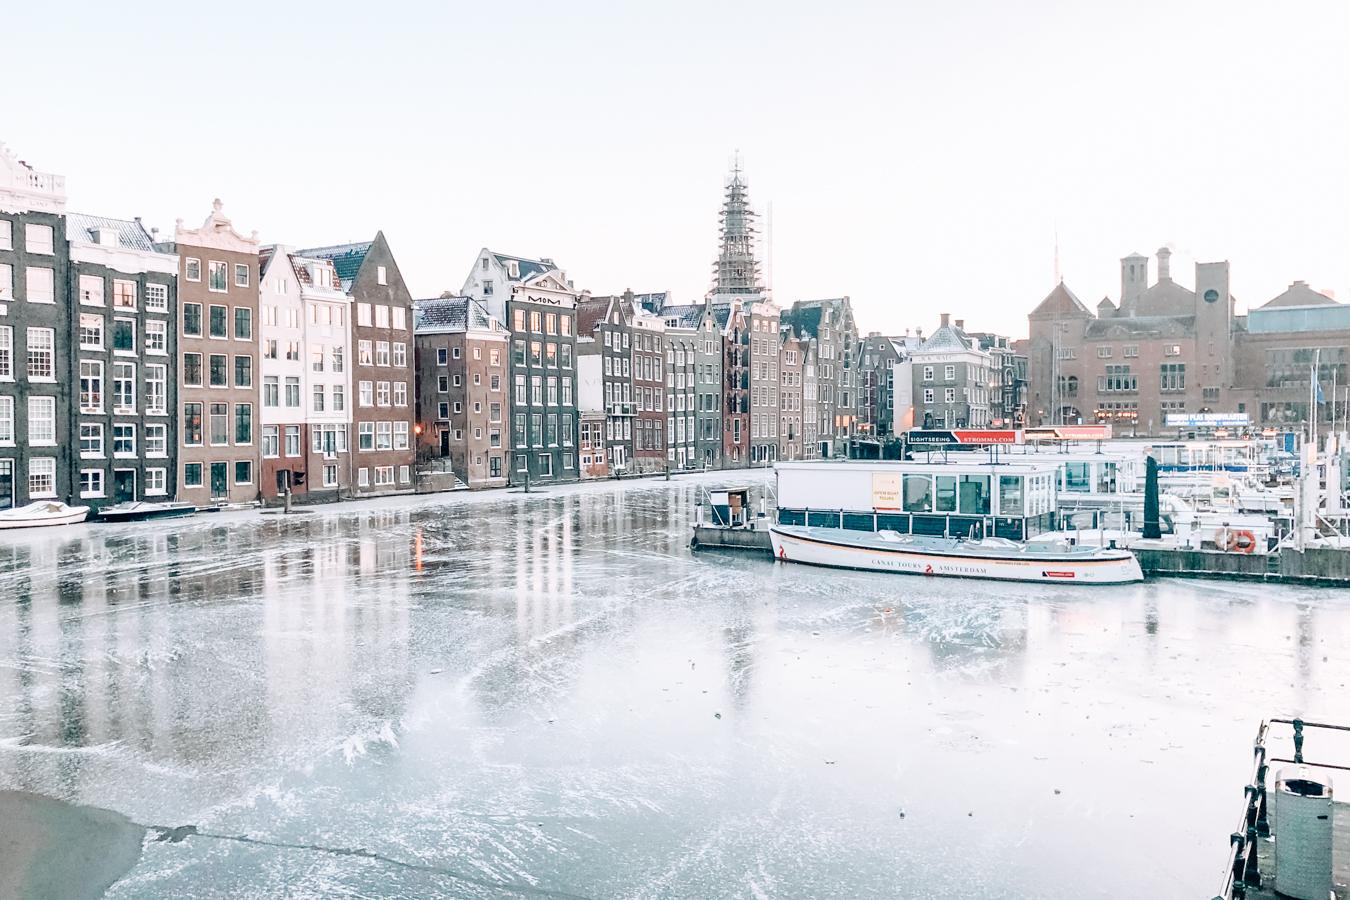 Frozen canal in Amsterdam